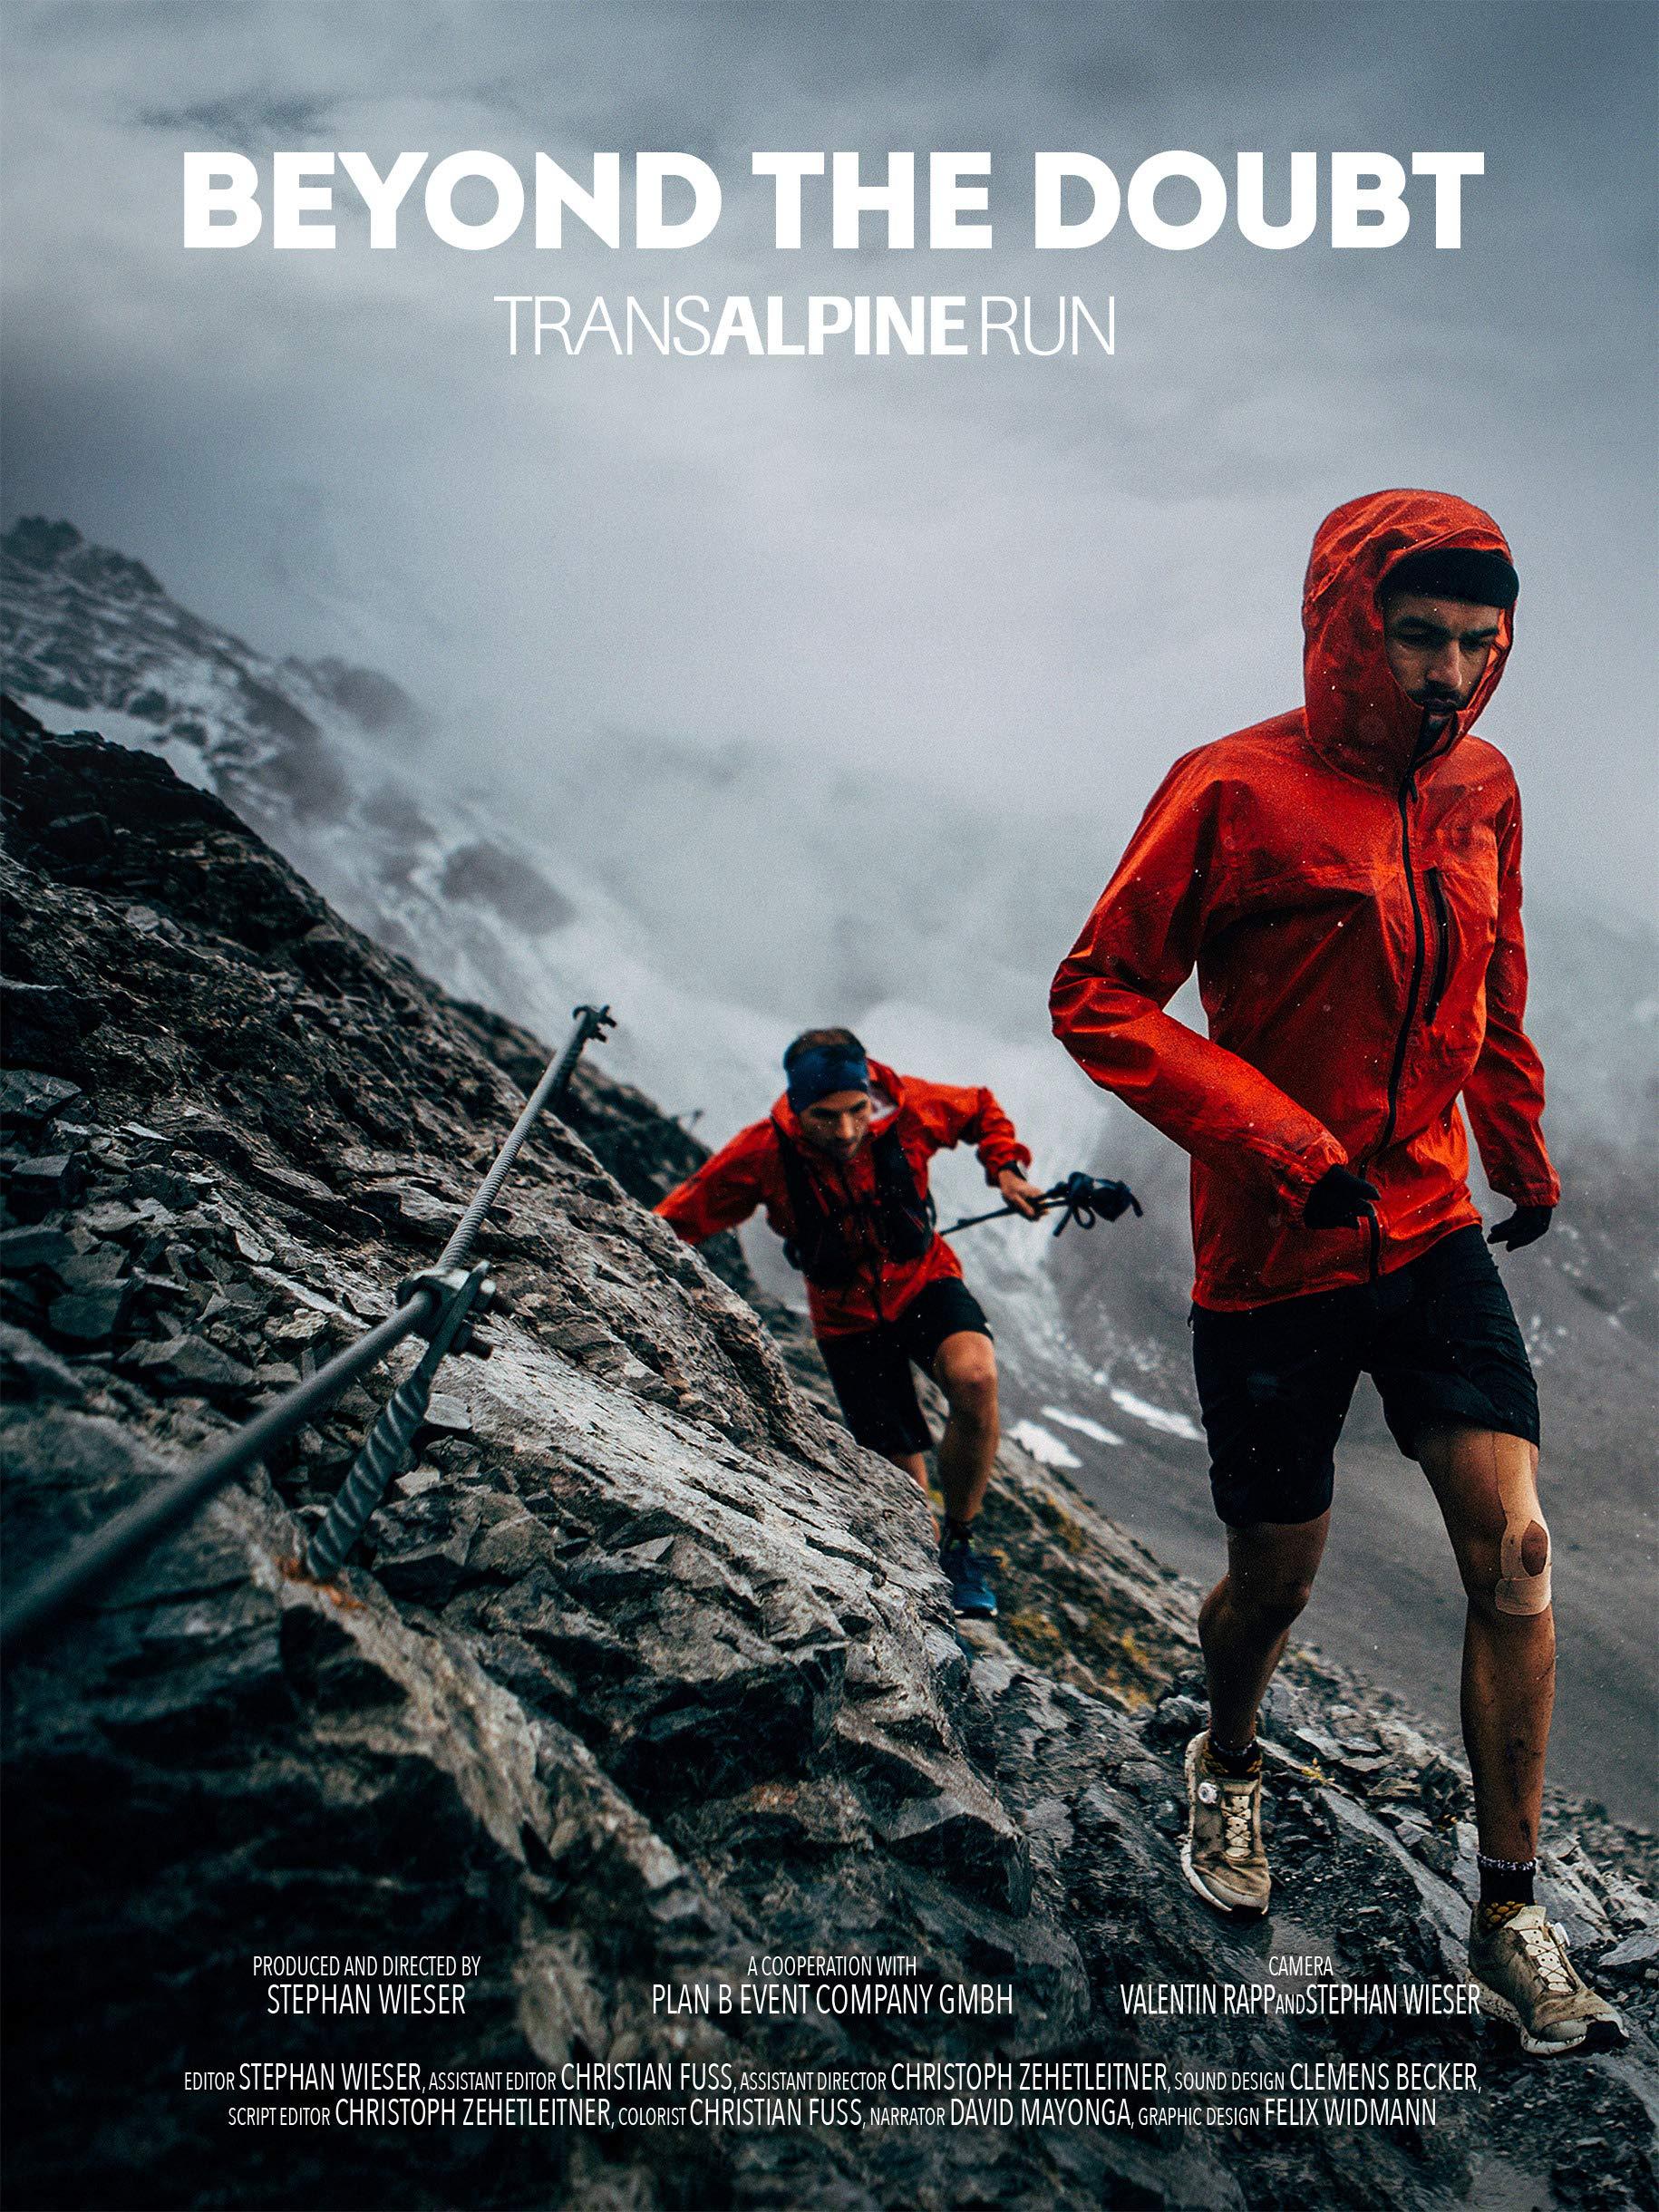 Beyond the Doubt - The Transalpine Run